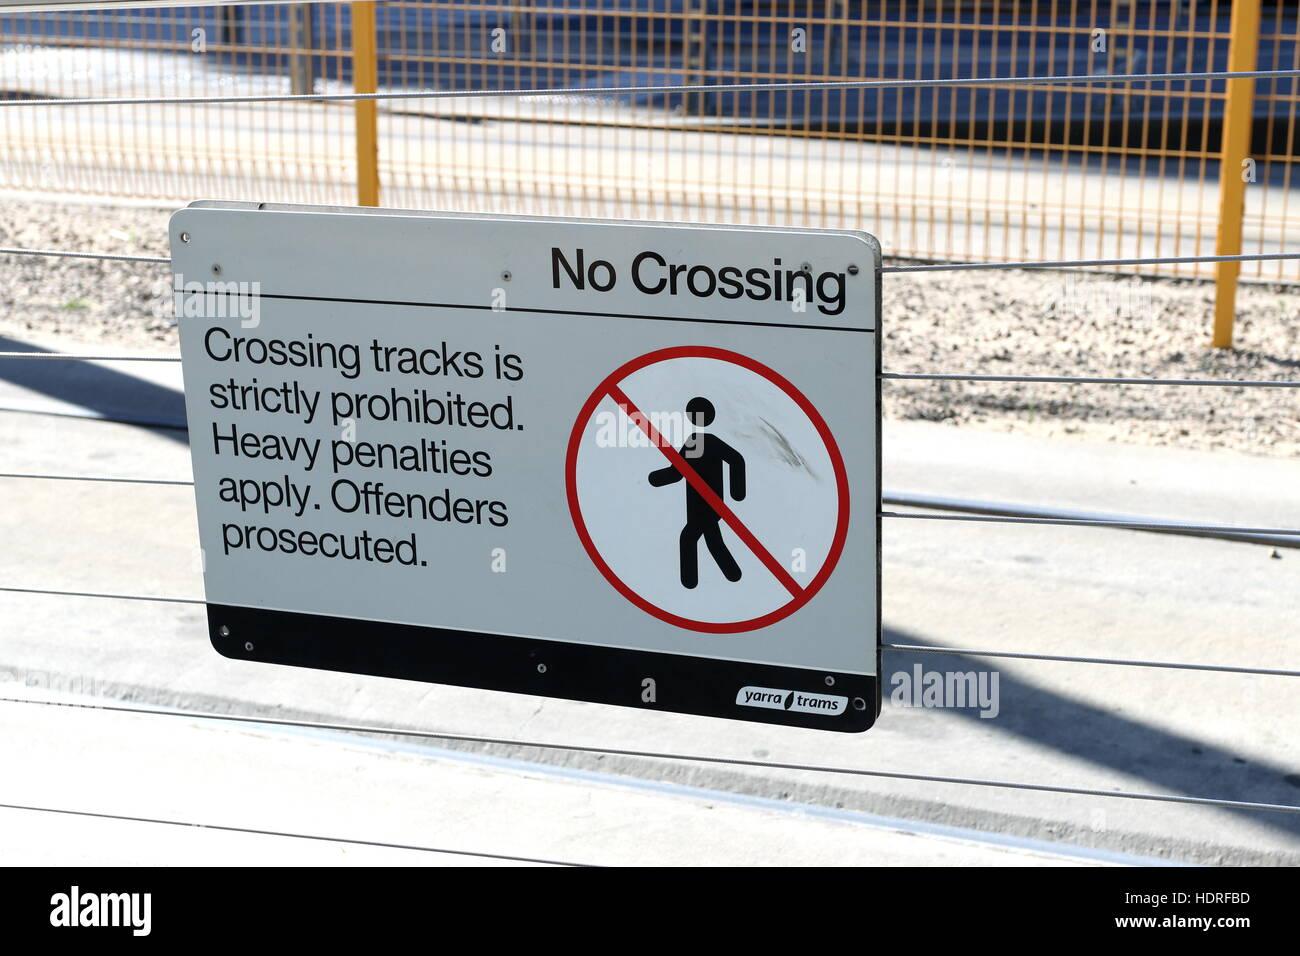 No crossing on tram tracks warning sign - Stock Image